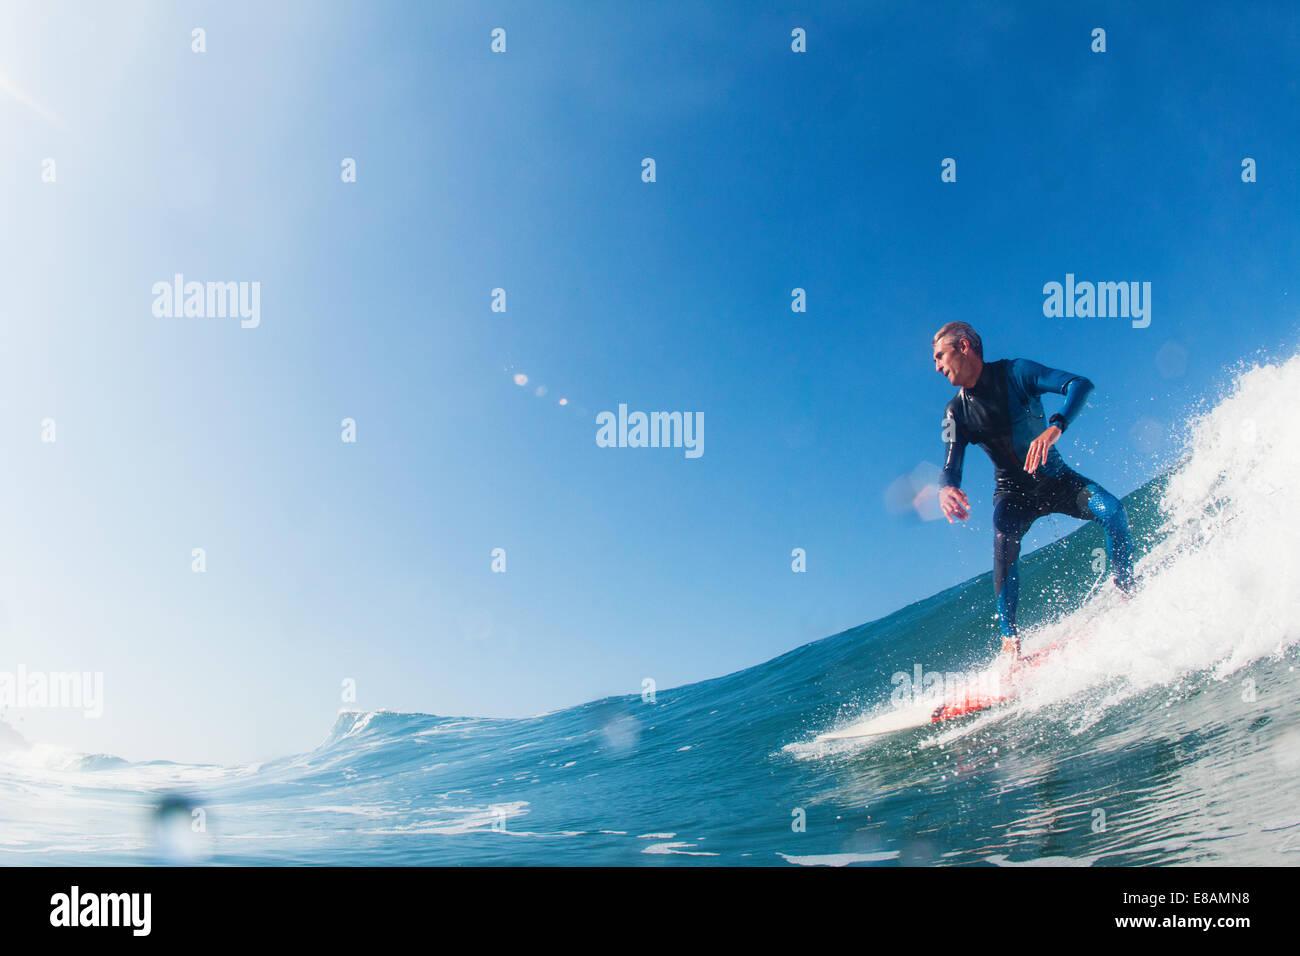 Mid adult man surfing, Leucadia, California, USA - Stock Image